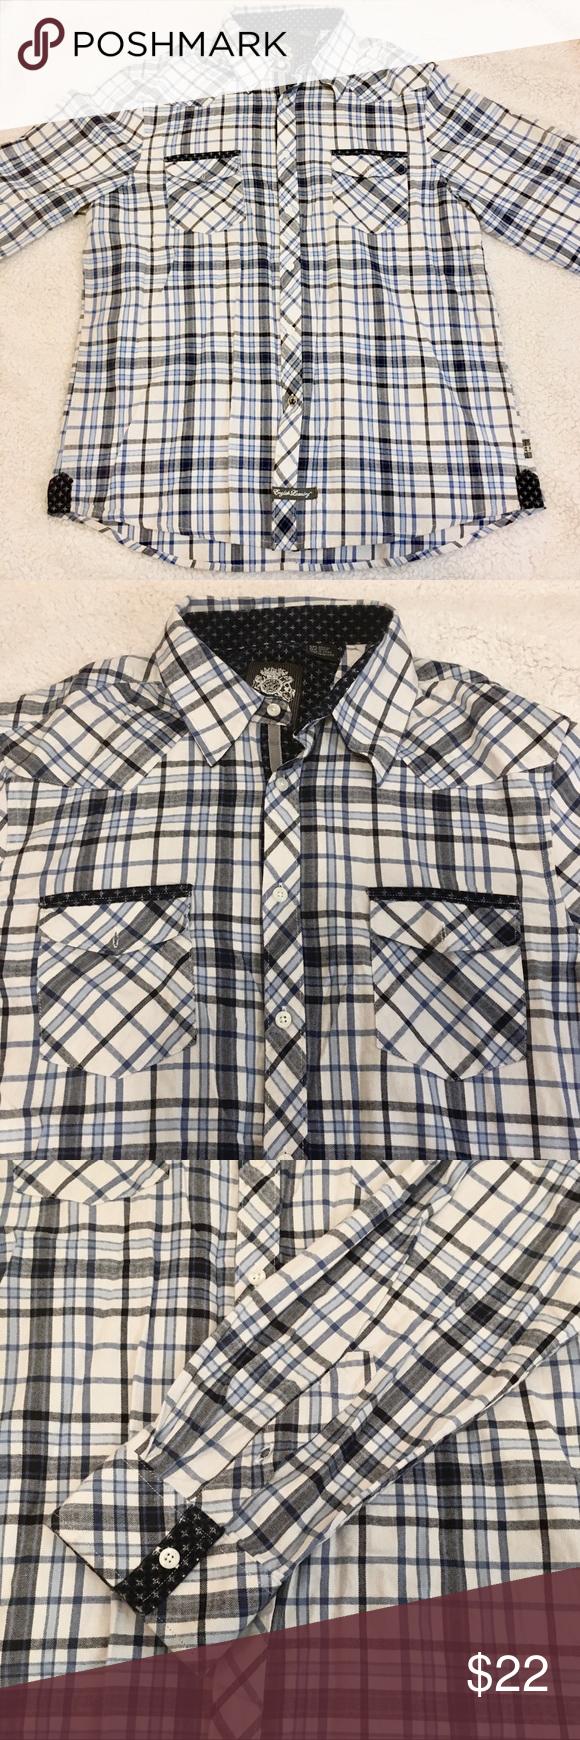 English Laundry Men S Button Down Dress Shirt Shirts Shirt Dress Colorful Shirts [ 1740 x 580 Pixel ]